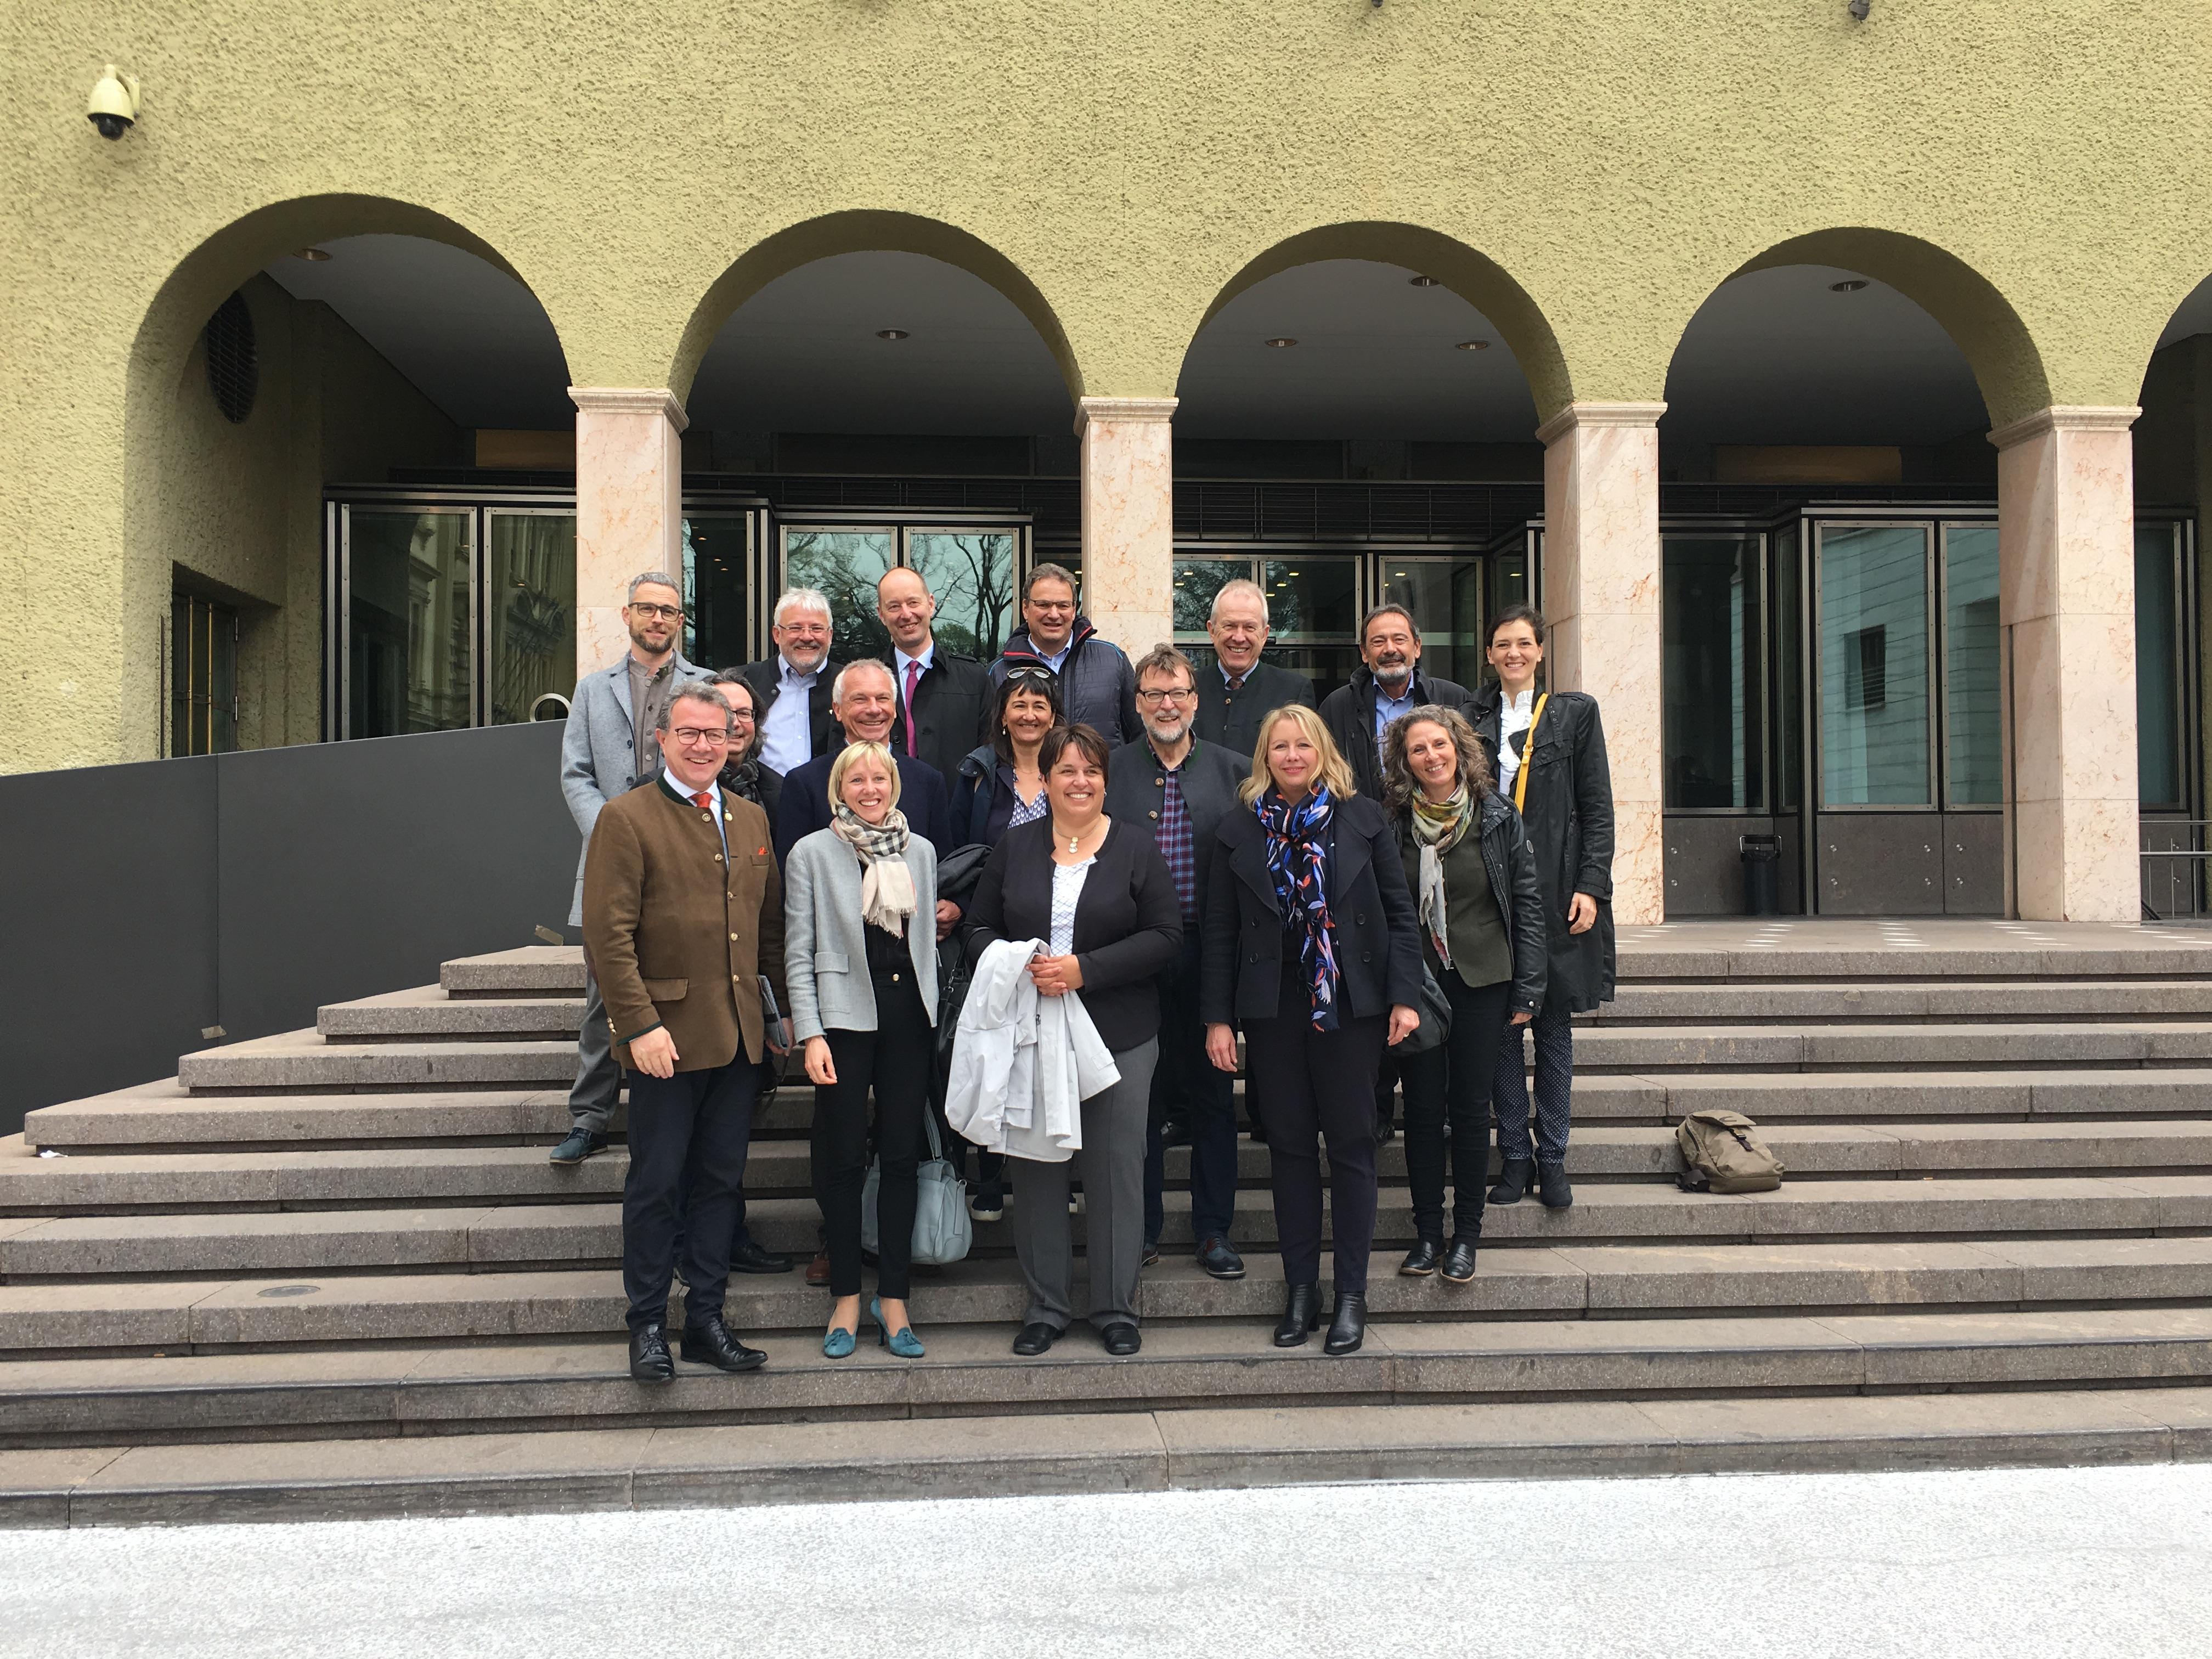 Exkursionsteilnehmer vor dem Südtiroler Landtag